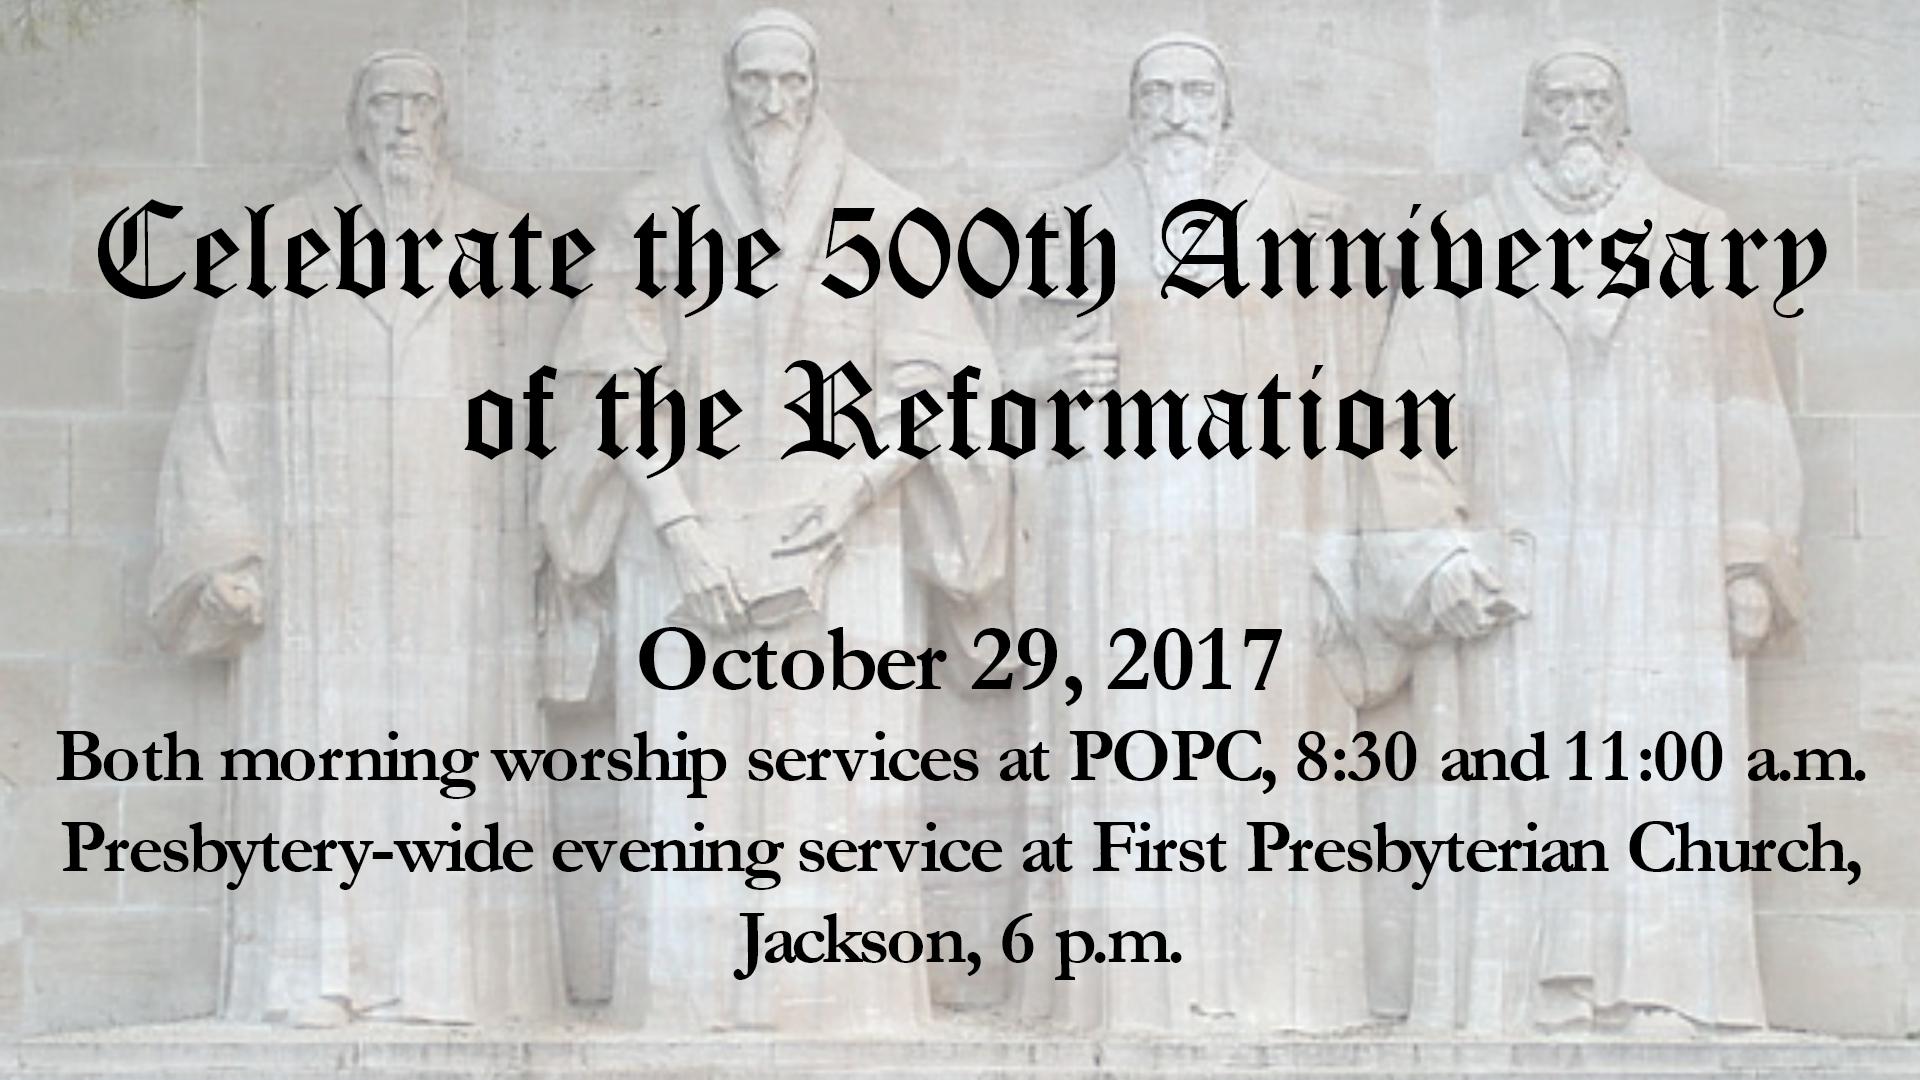 Reformation Sunday Slide 1.jpg